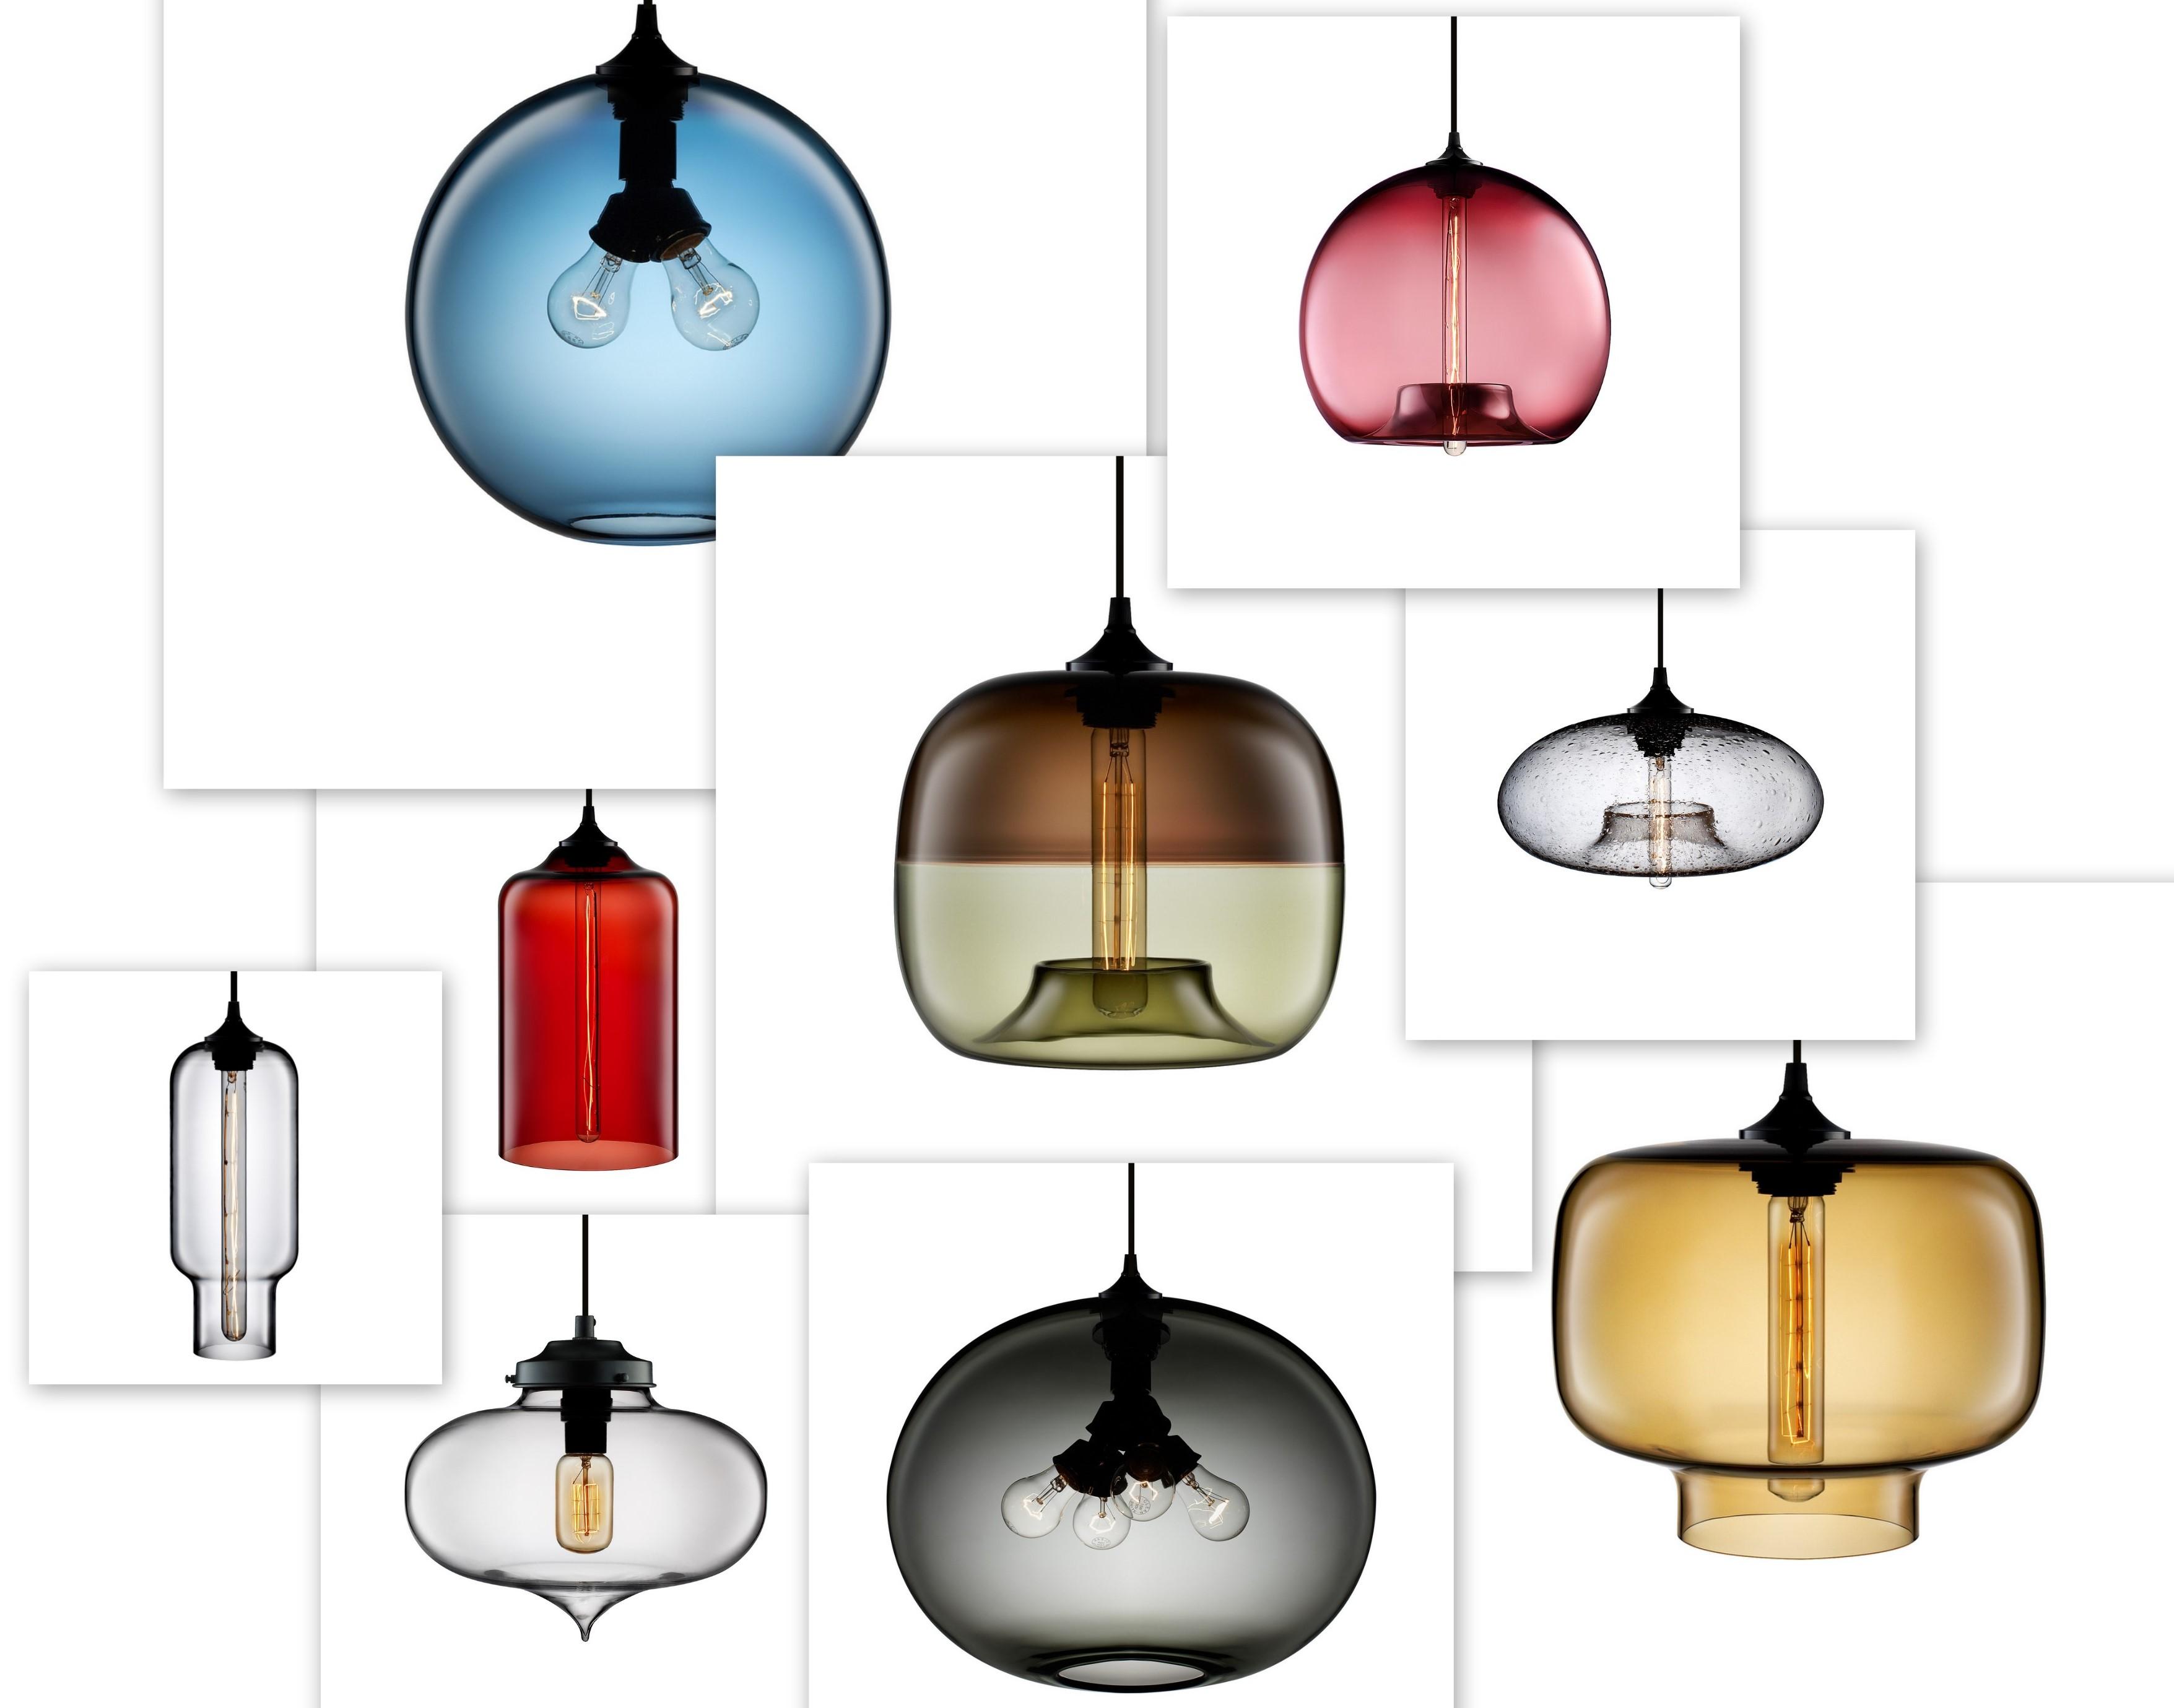 hand blown glass pendant lights. Black Bedroom Furniture Sets. Home Design Ideas